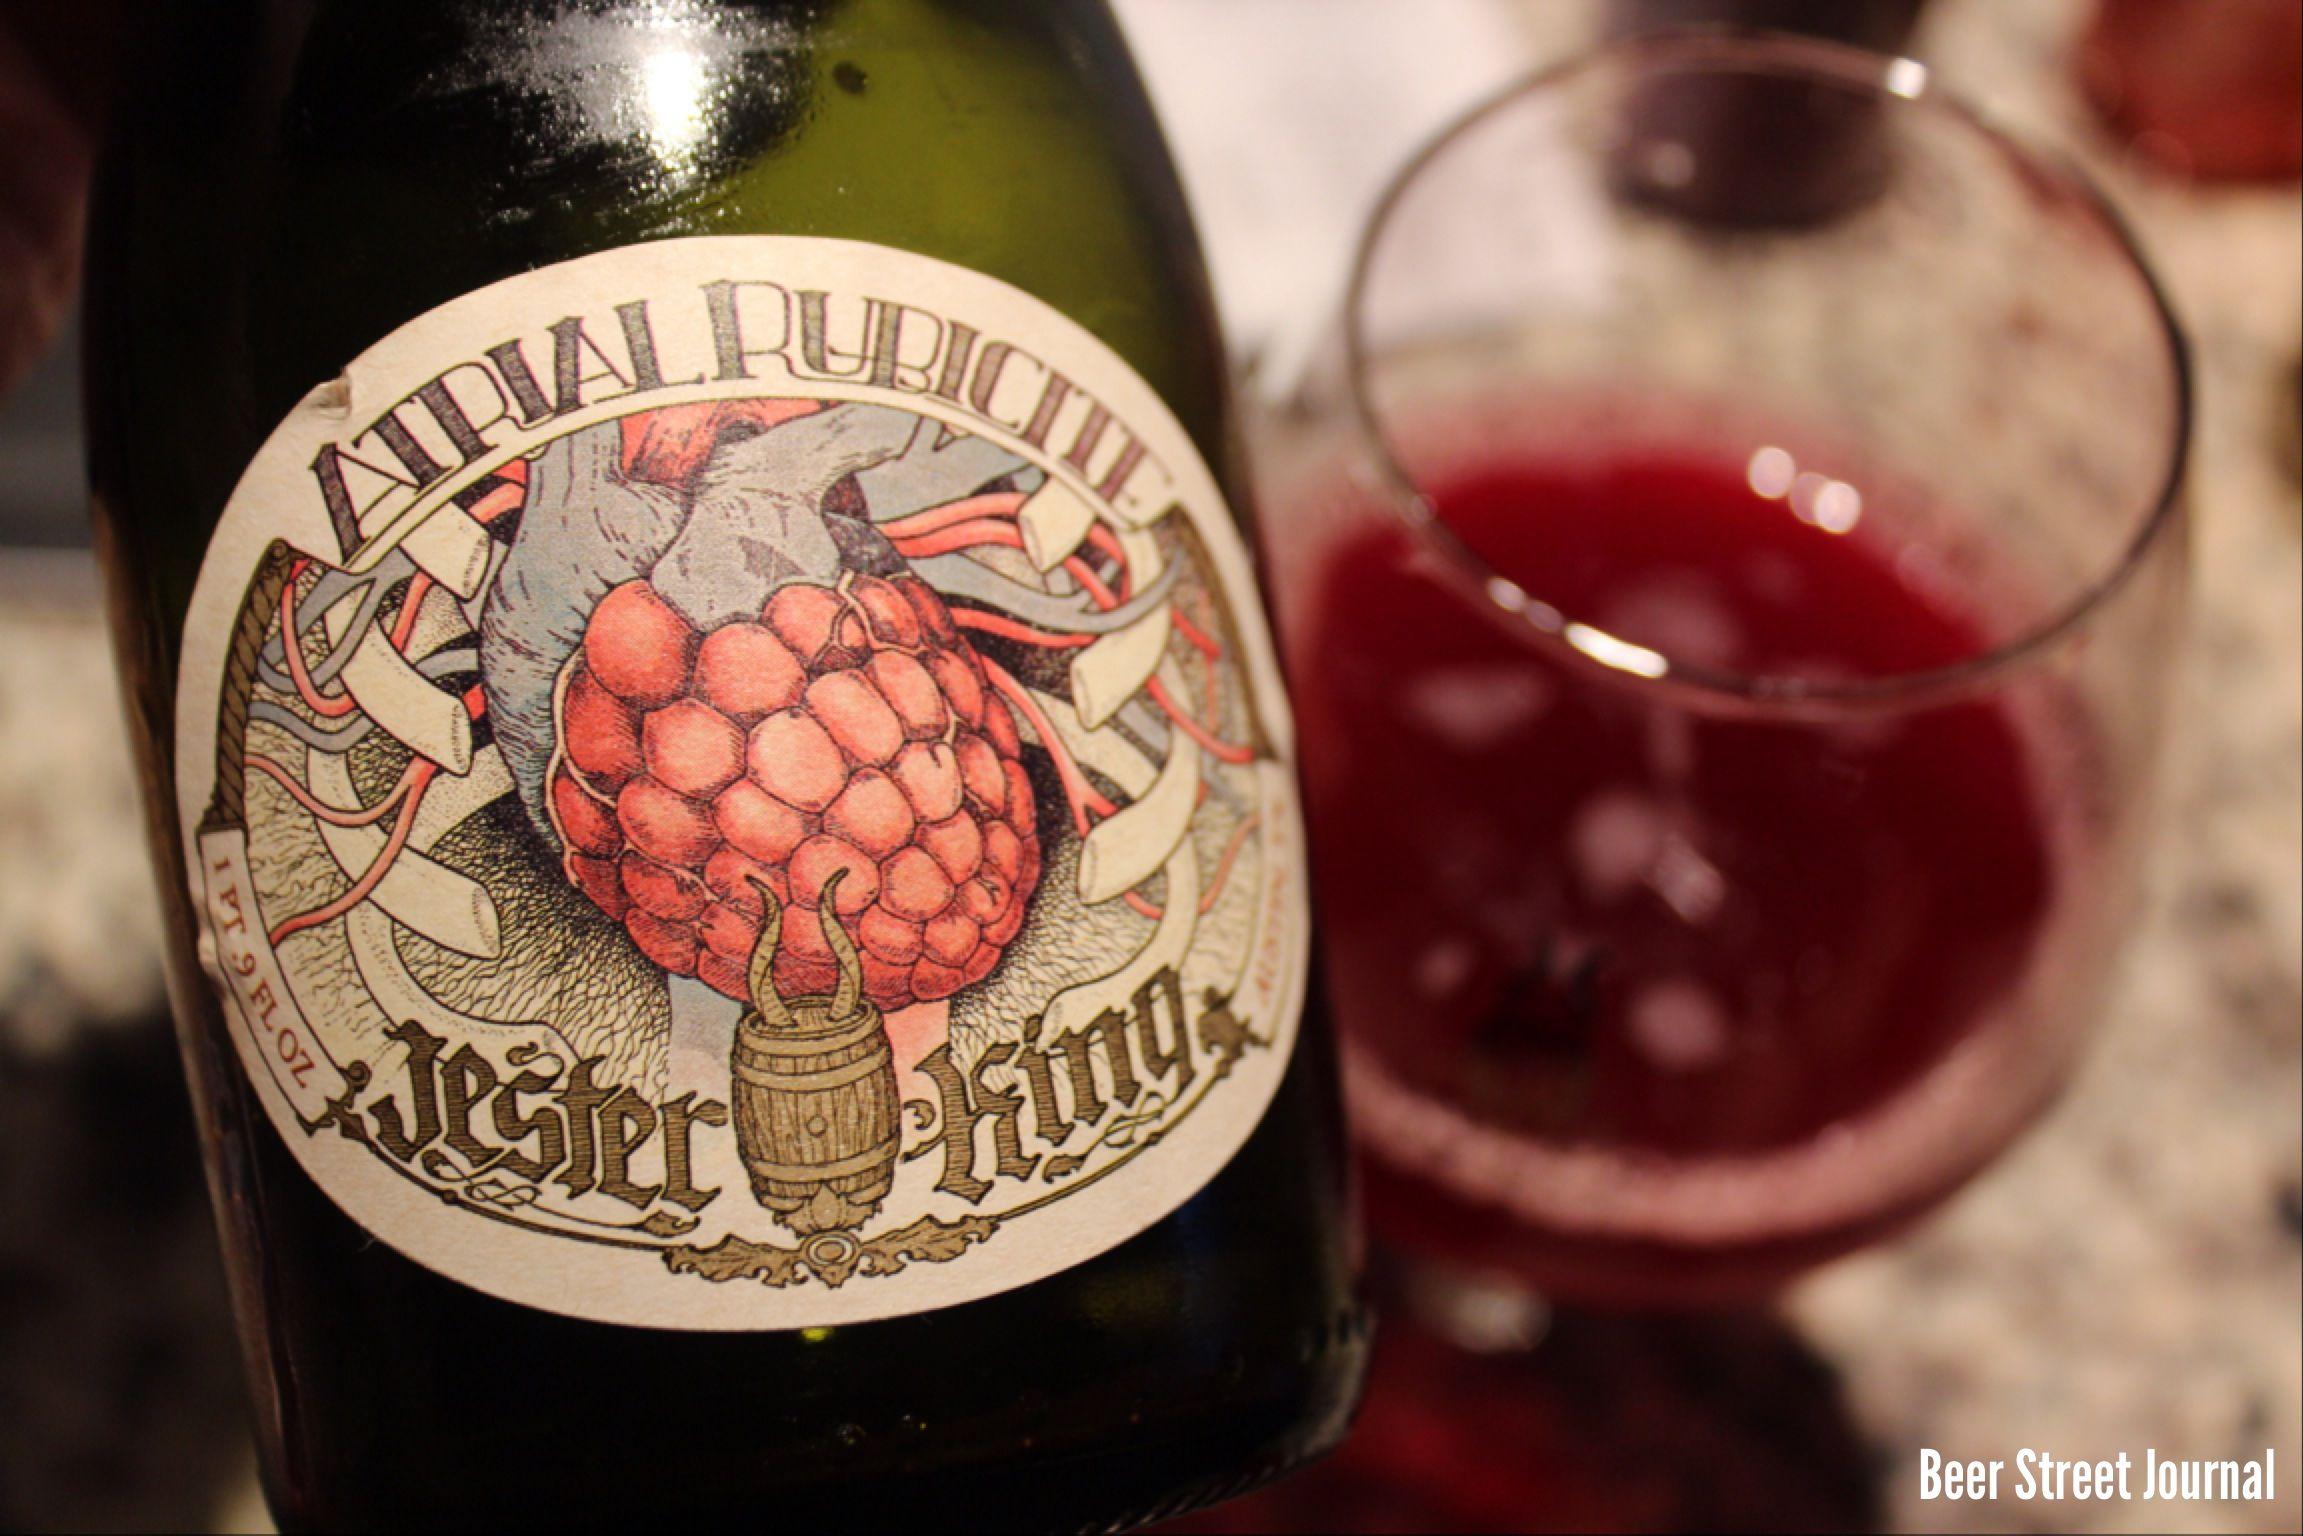 Jester King Atrial Rubicite American Wild Ale Oak Aged With Raspberries 5 8 Beer Label Wine Bottle Beer